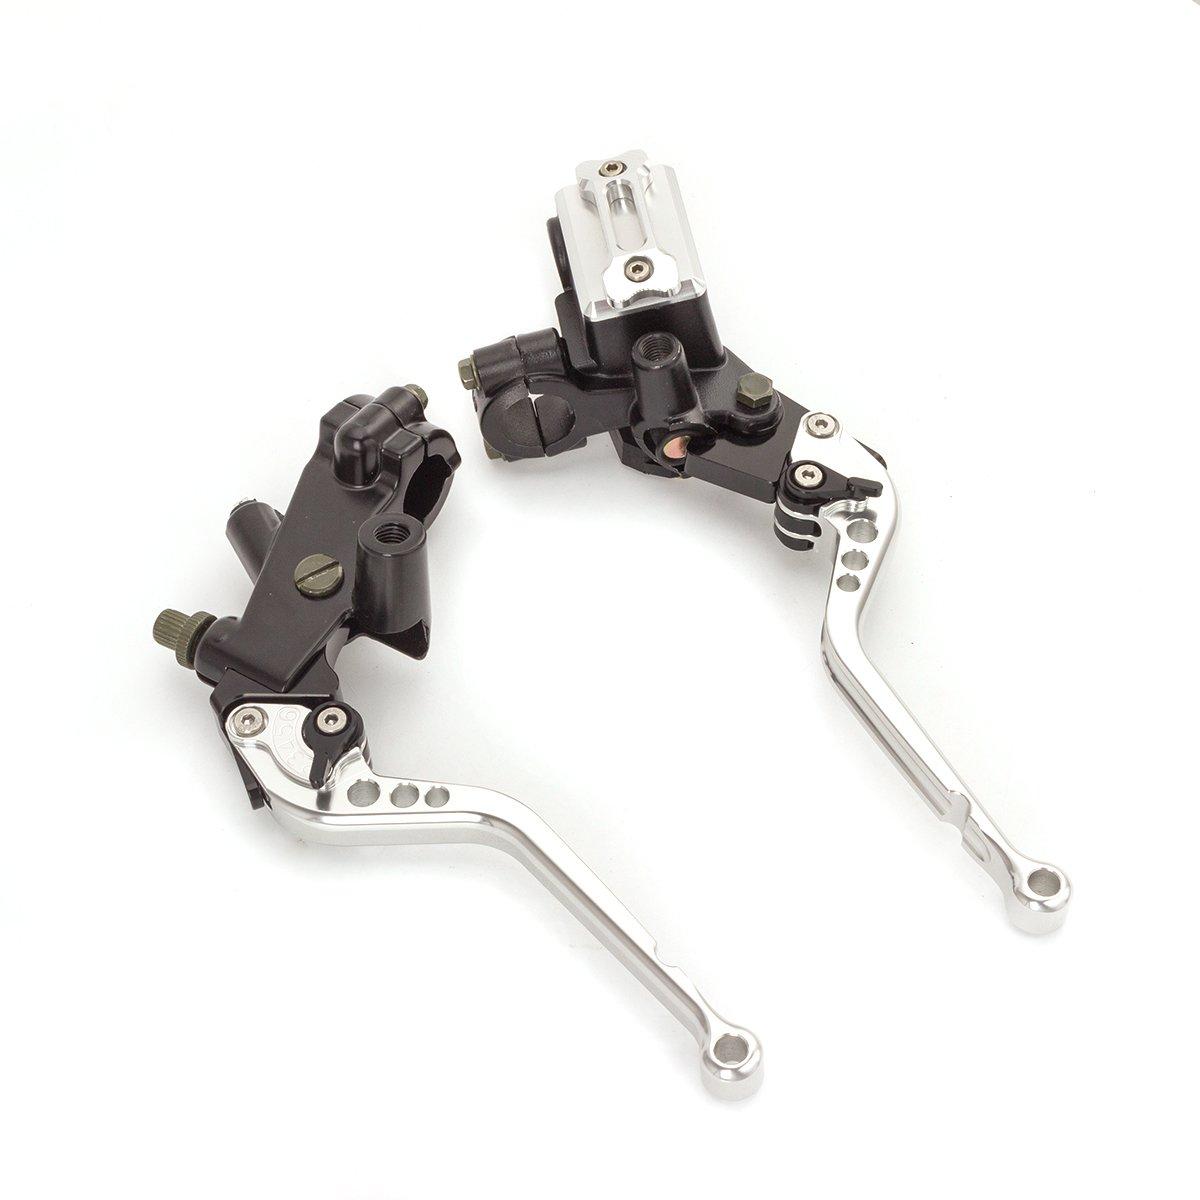 Amazon.com: Rzmmotor CNC 7/8